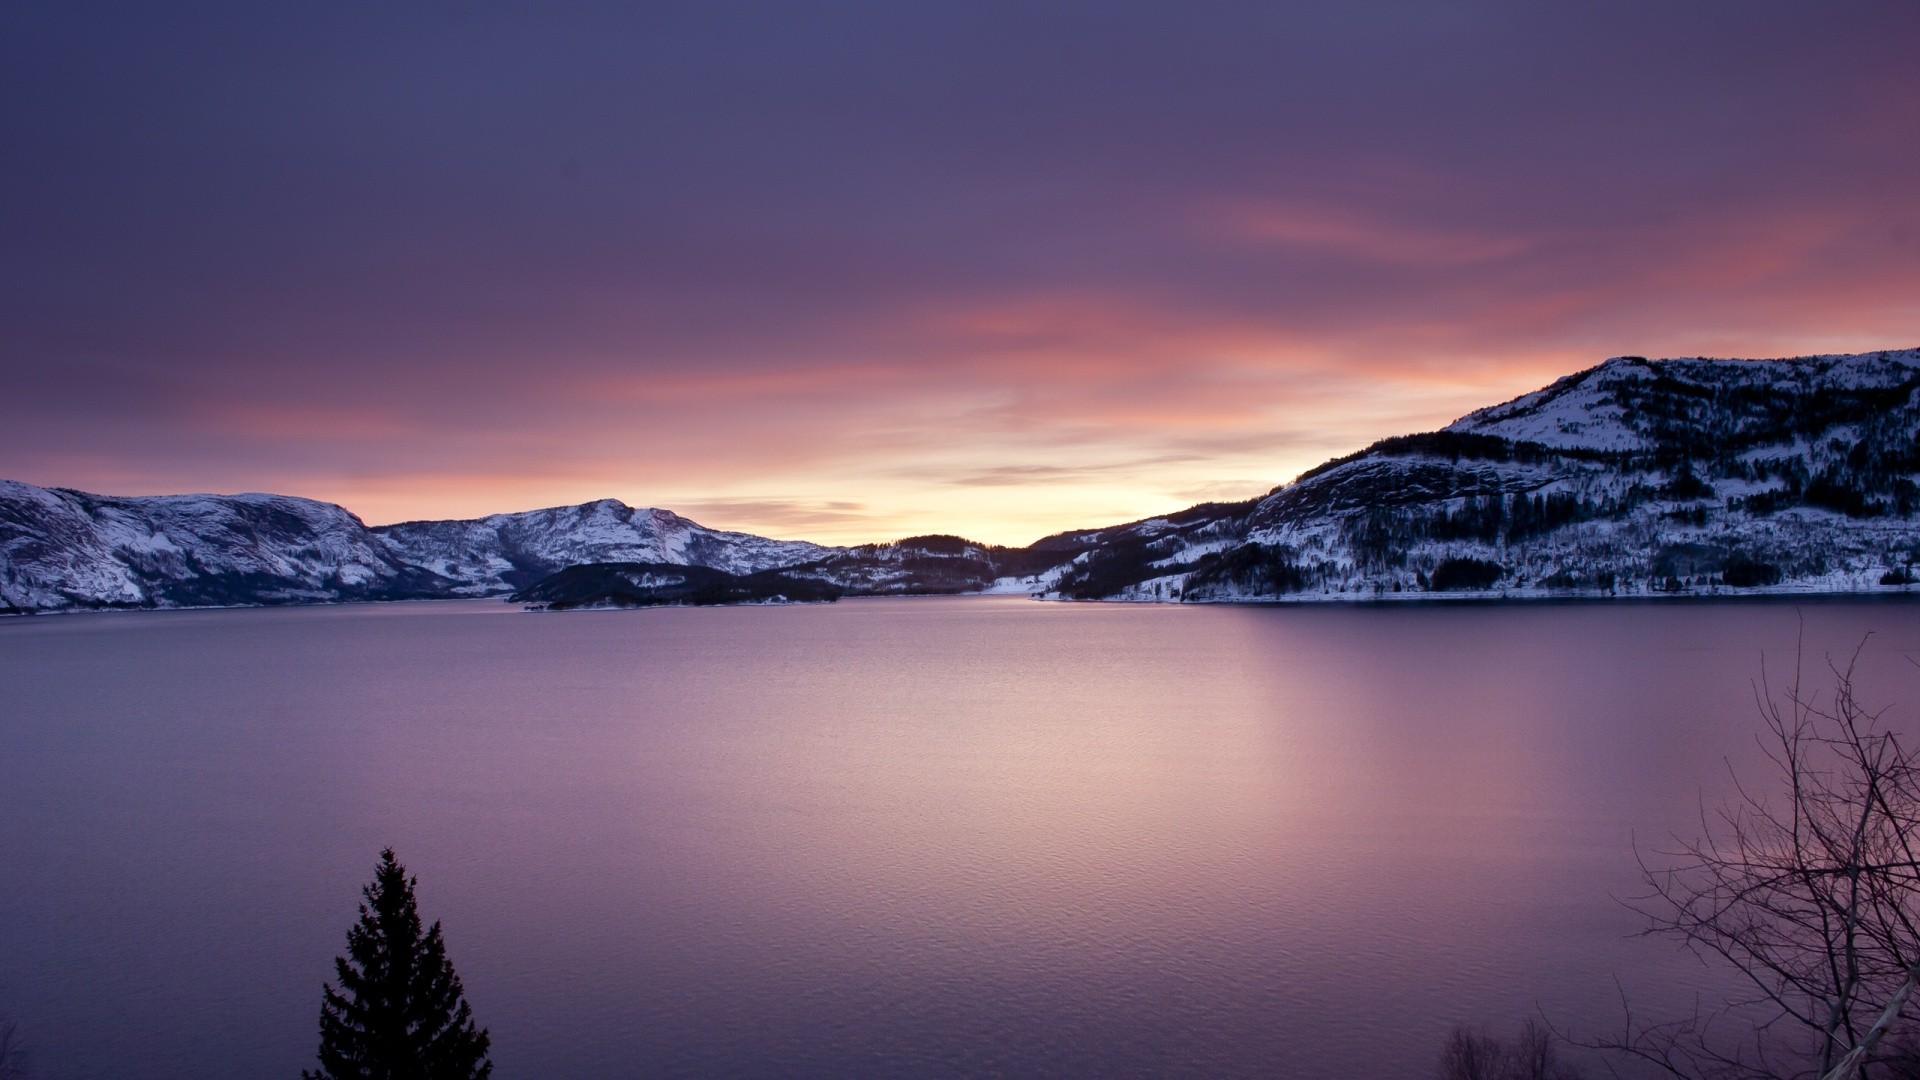 Black · aesthetic · balck; nature, Lake, Sunrise, Mountain Wallpapers HD / Desktop